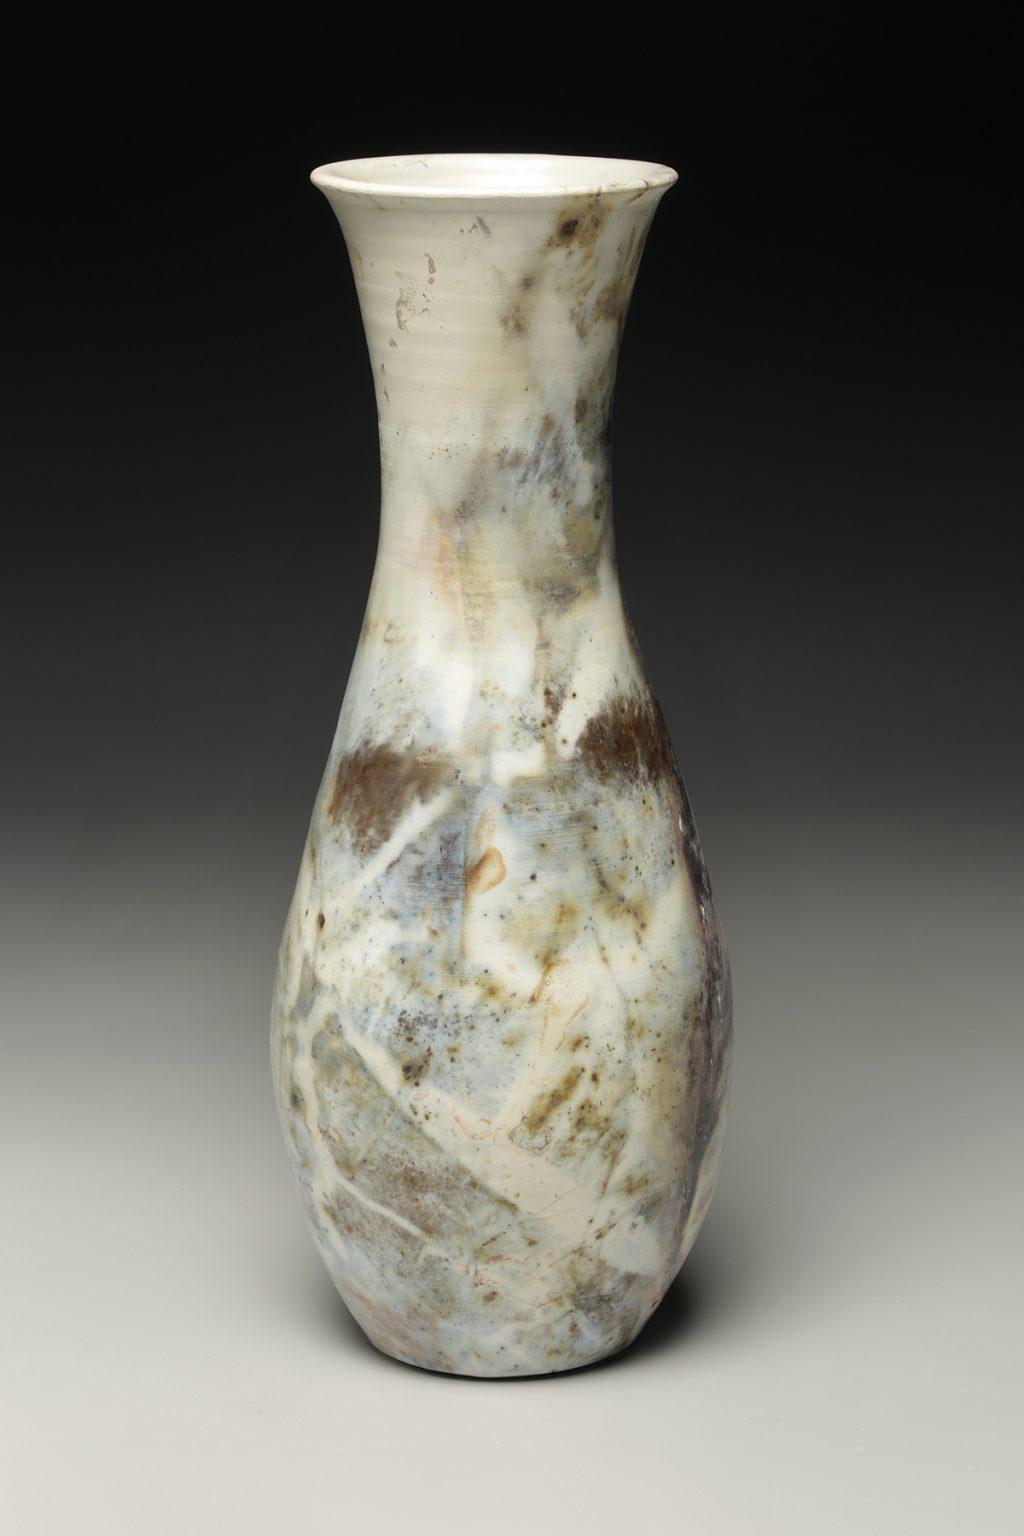 Judi Harwood, The Village Potters Clay Center, Mummy Saggar, Saggar, Raku